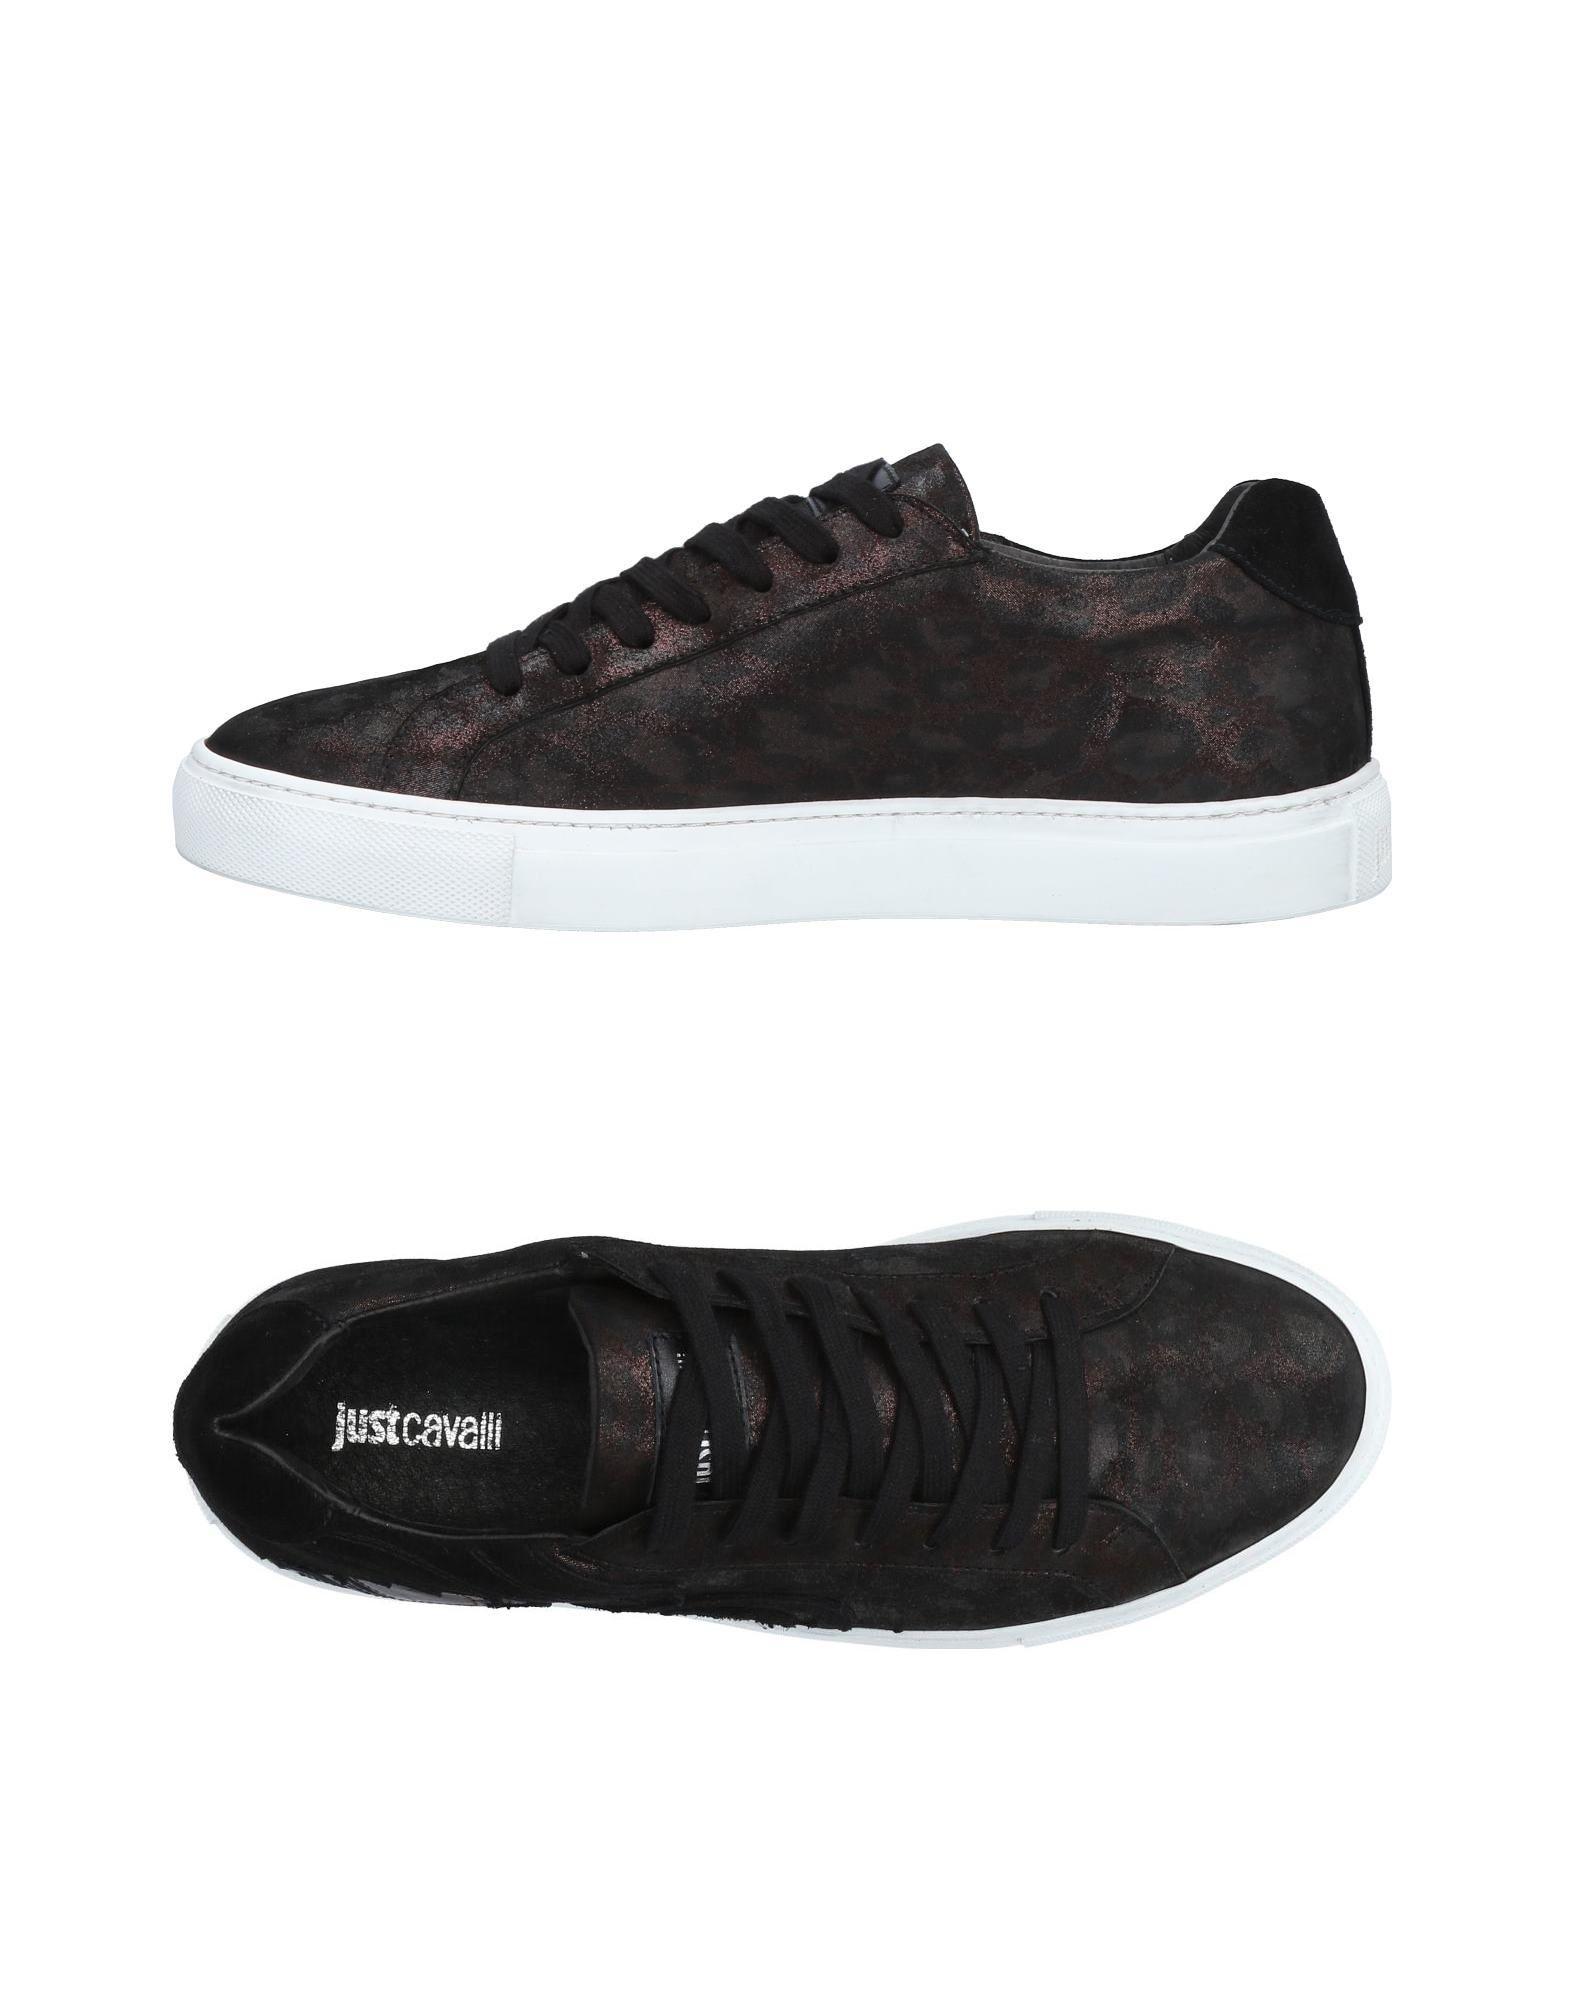 Just Cavalli Sneakers Herren  11472977XB Gute Qualität beliebte Schuhe